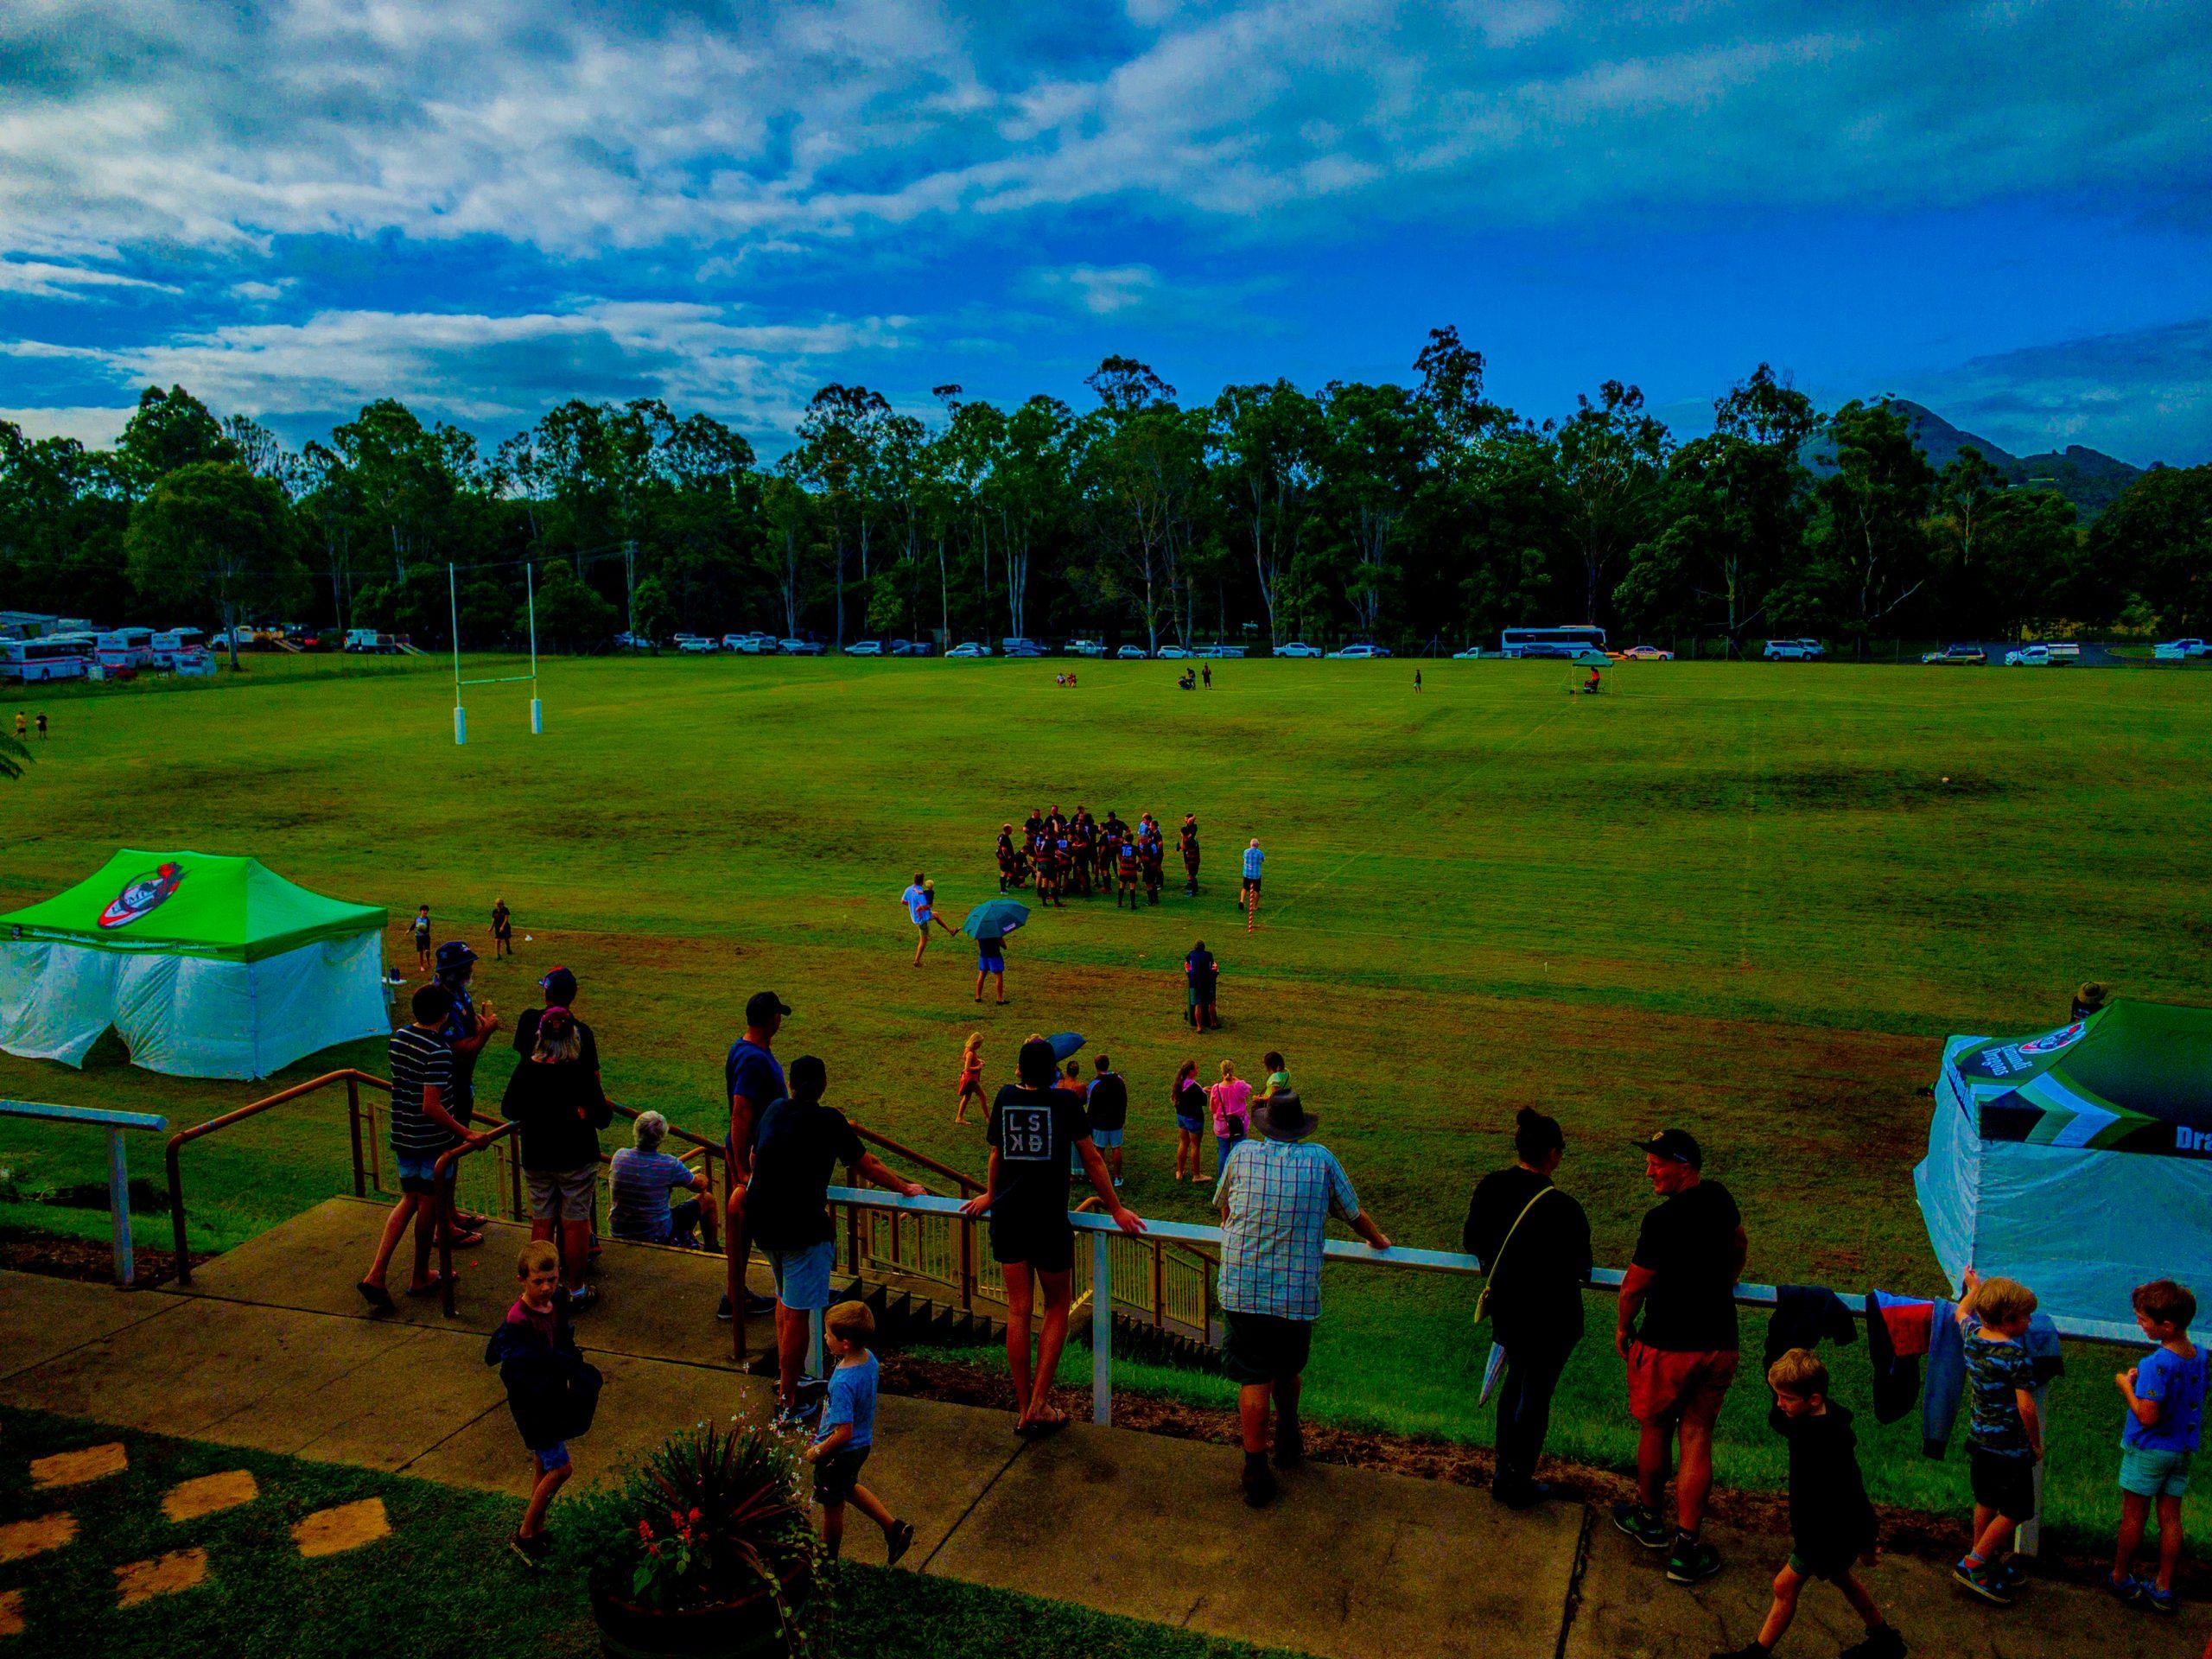 Best home training routine on the Sunshine Coast